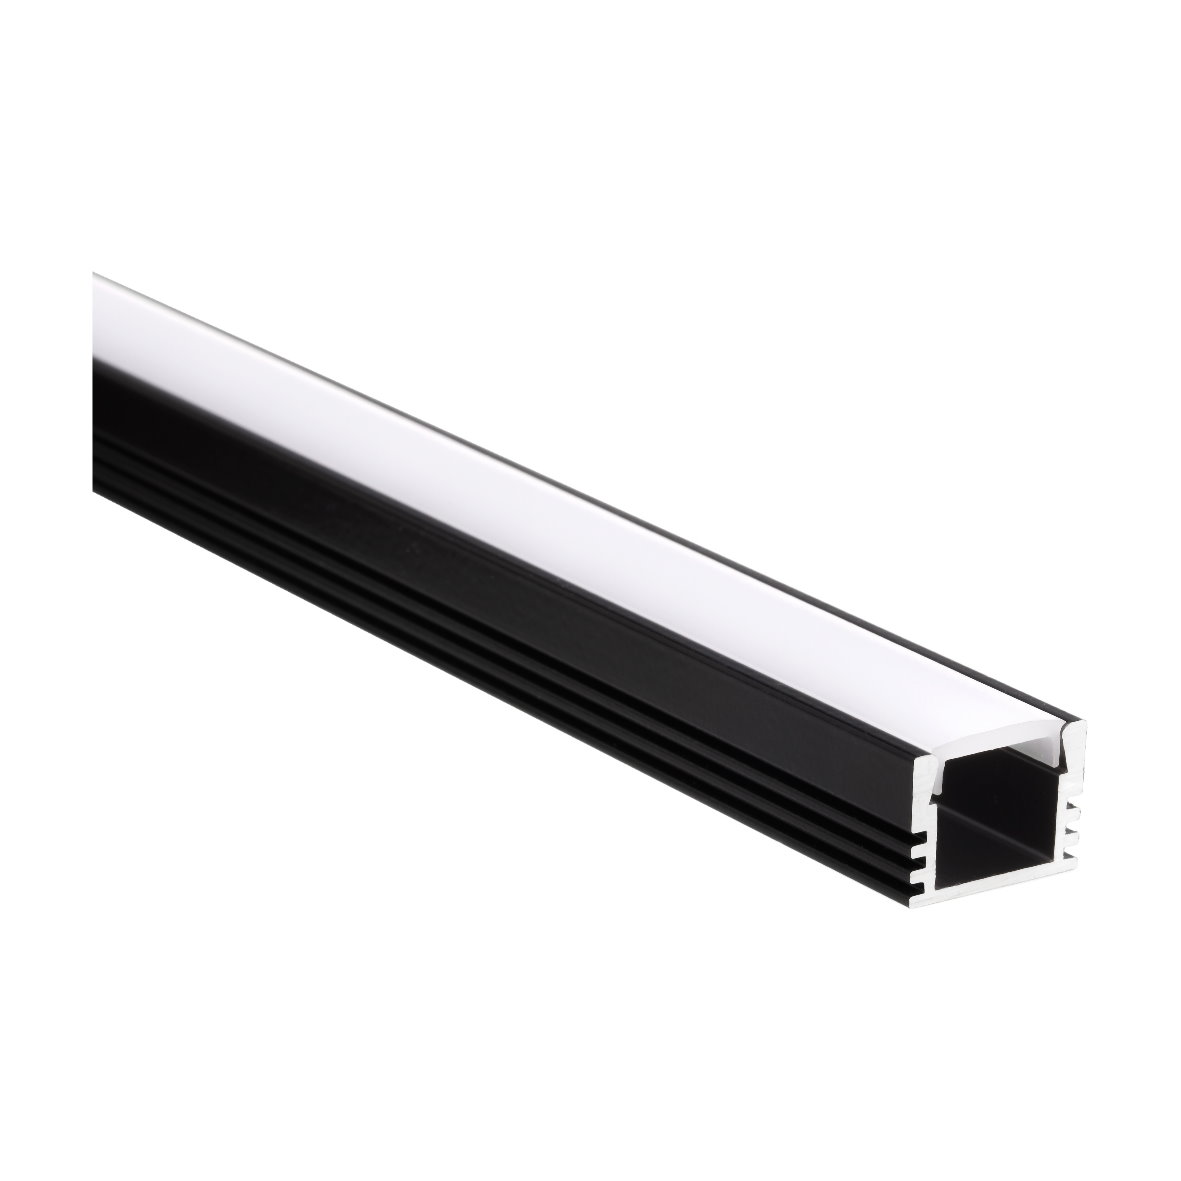 14 9 m led aluprofil eloxiert abdeckung aluminium. Black Bedroom Furniture Sets. Home Design Ideas